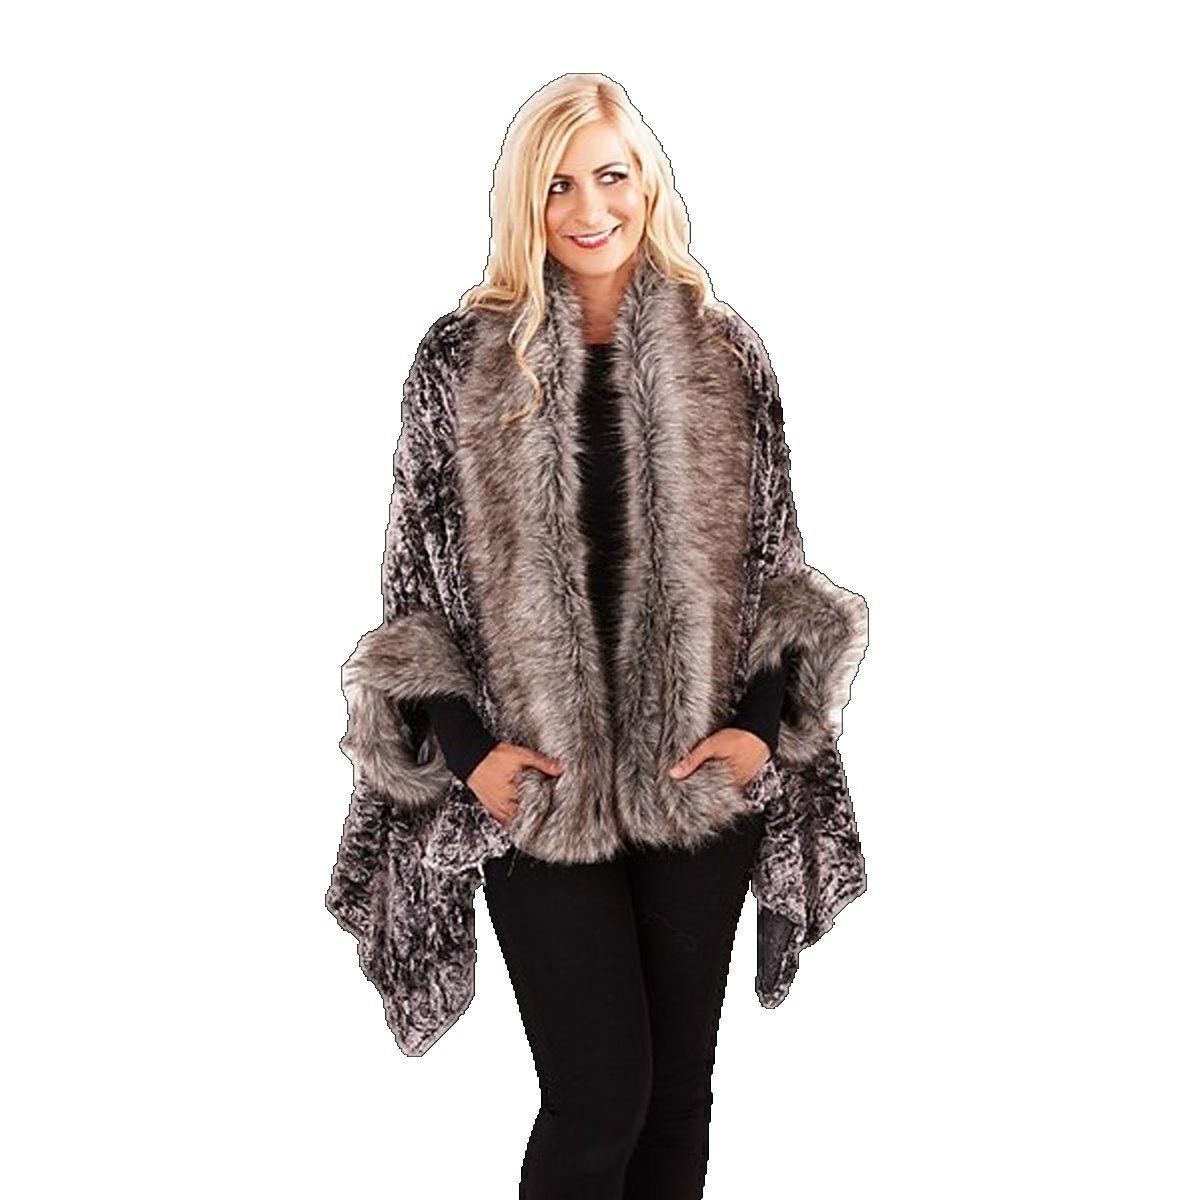 manteau drap femme fourrure synth tique poncho luxe velours ebay. Black Bedroom Furniture Sets. Home Design Ideas